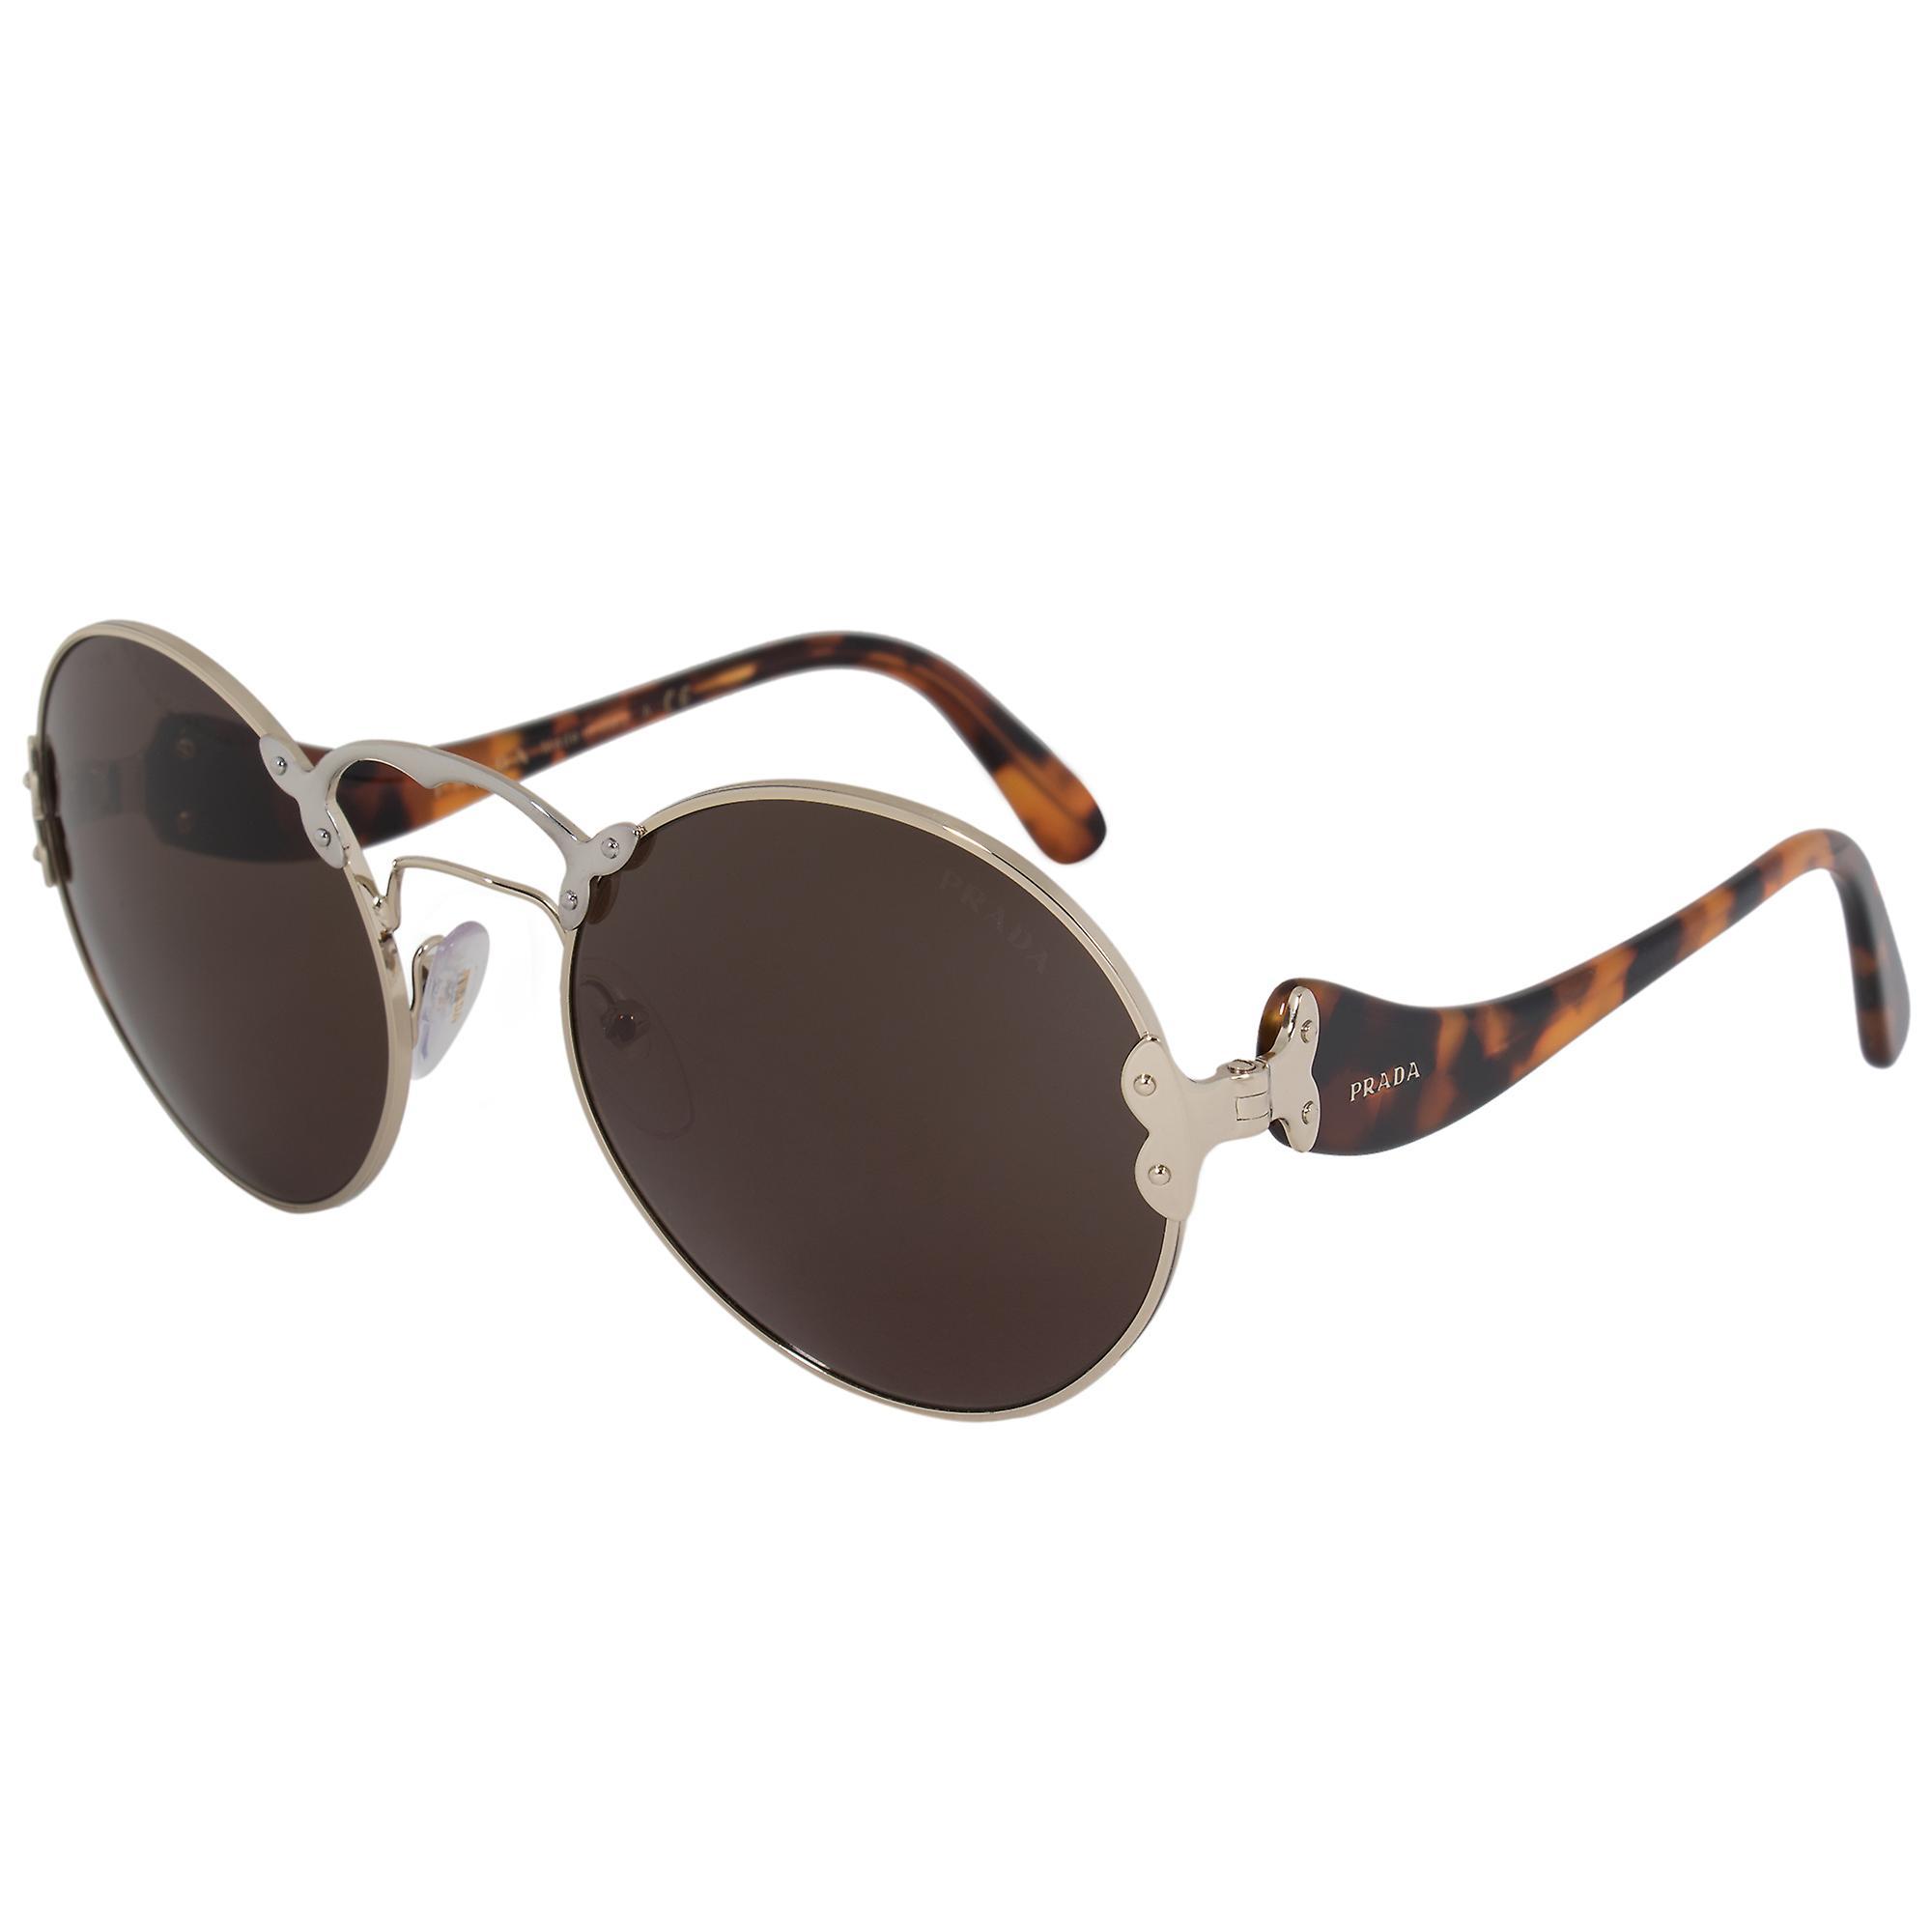 Prada Wanderer Round Sunglasses PR55TS ZVN4J1 57 | Pale Gold Frame | Grey Lenses